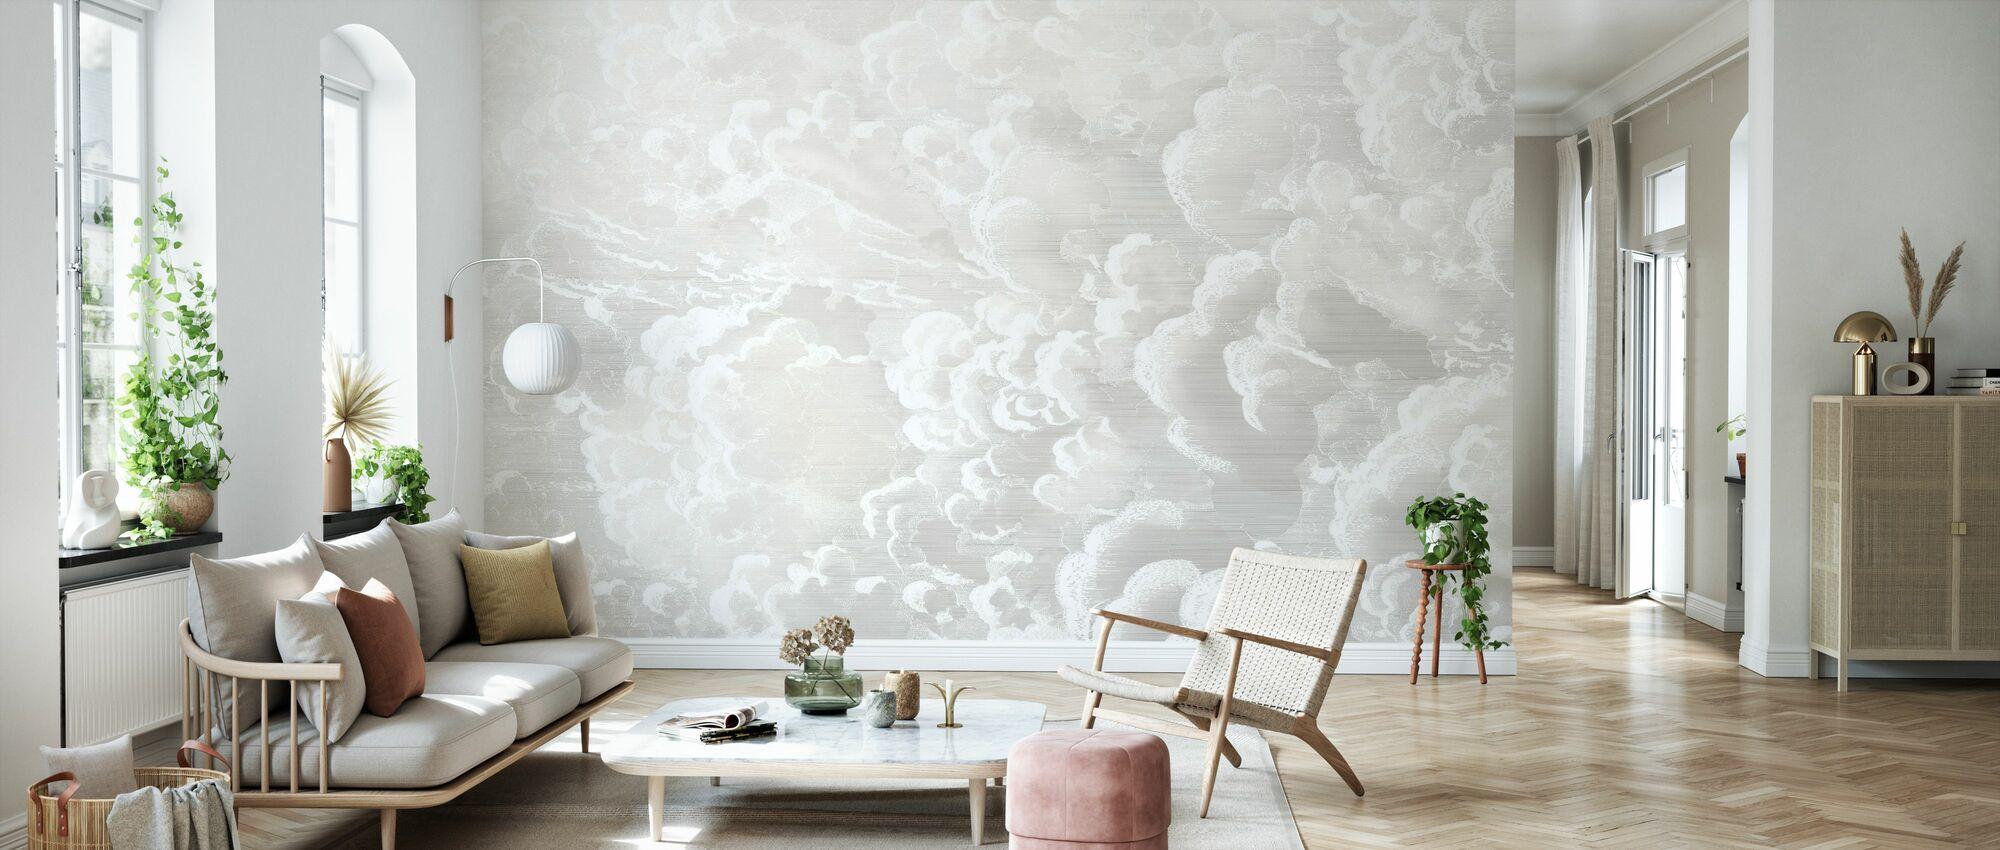 Cradled in Clouds - Pastel - Wallpaper - Living Room